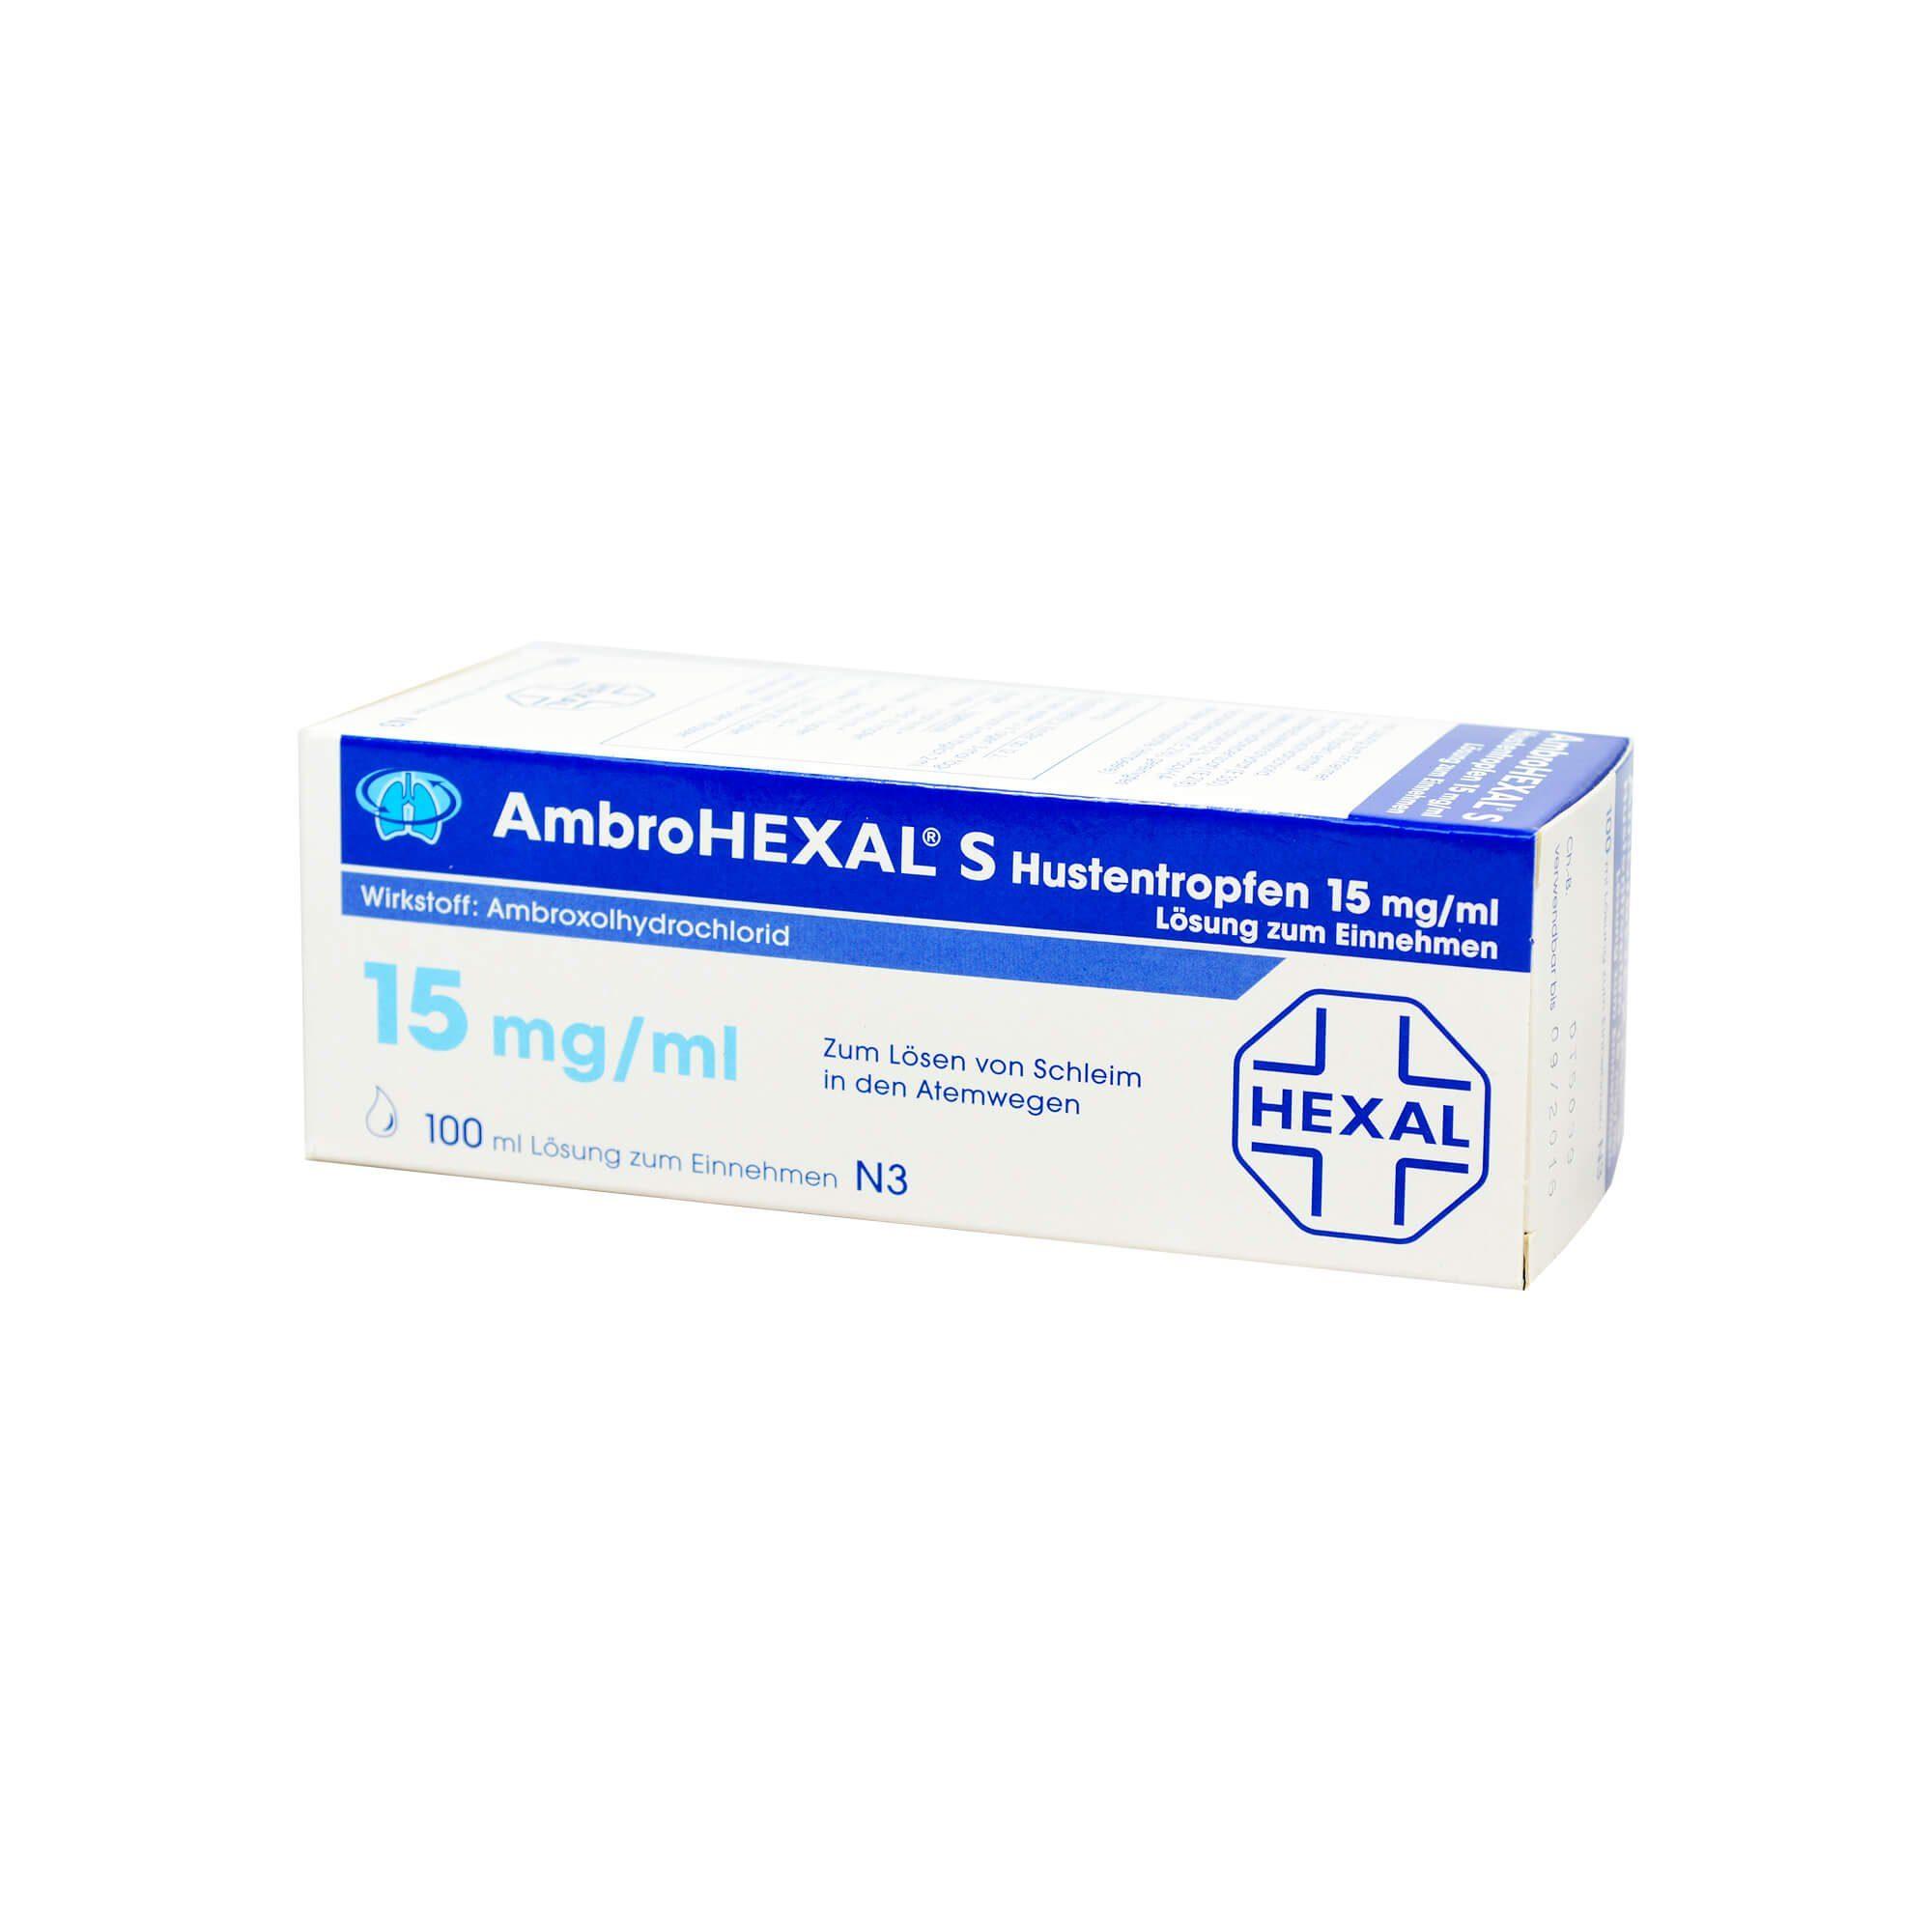 AmbroHEXAL Hustentropfen 15 mg/ml , 100 ml